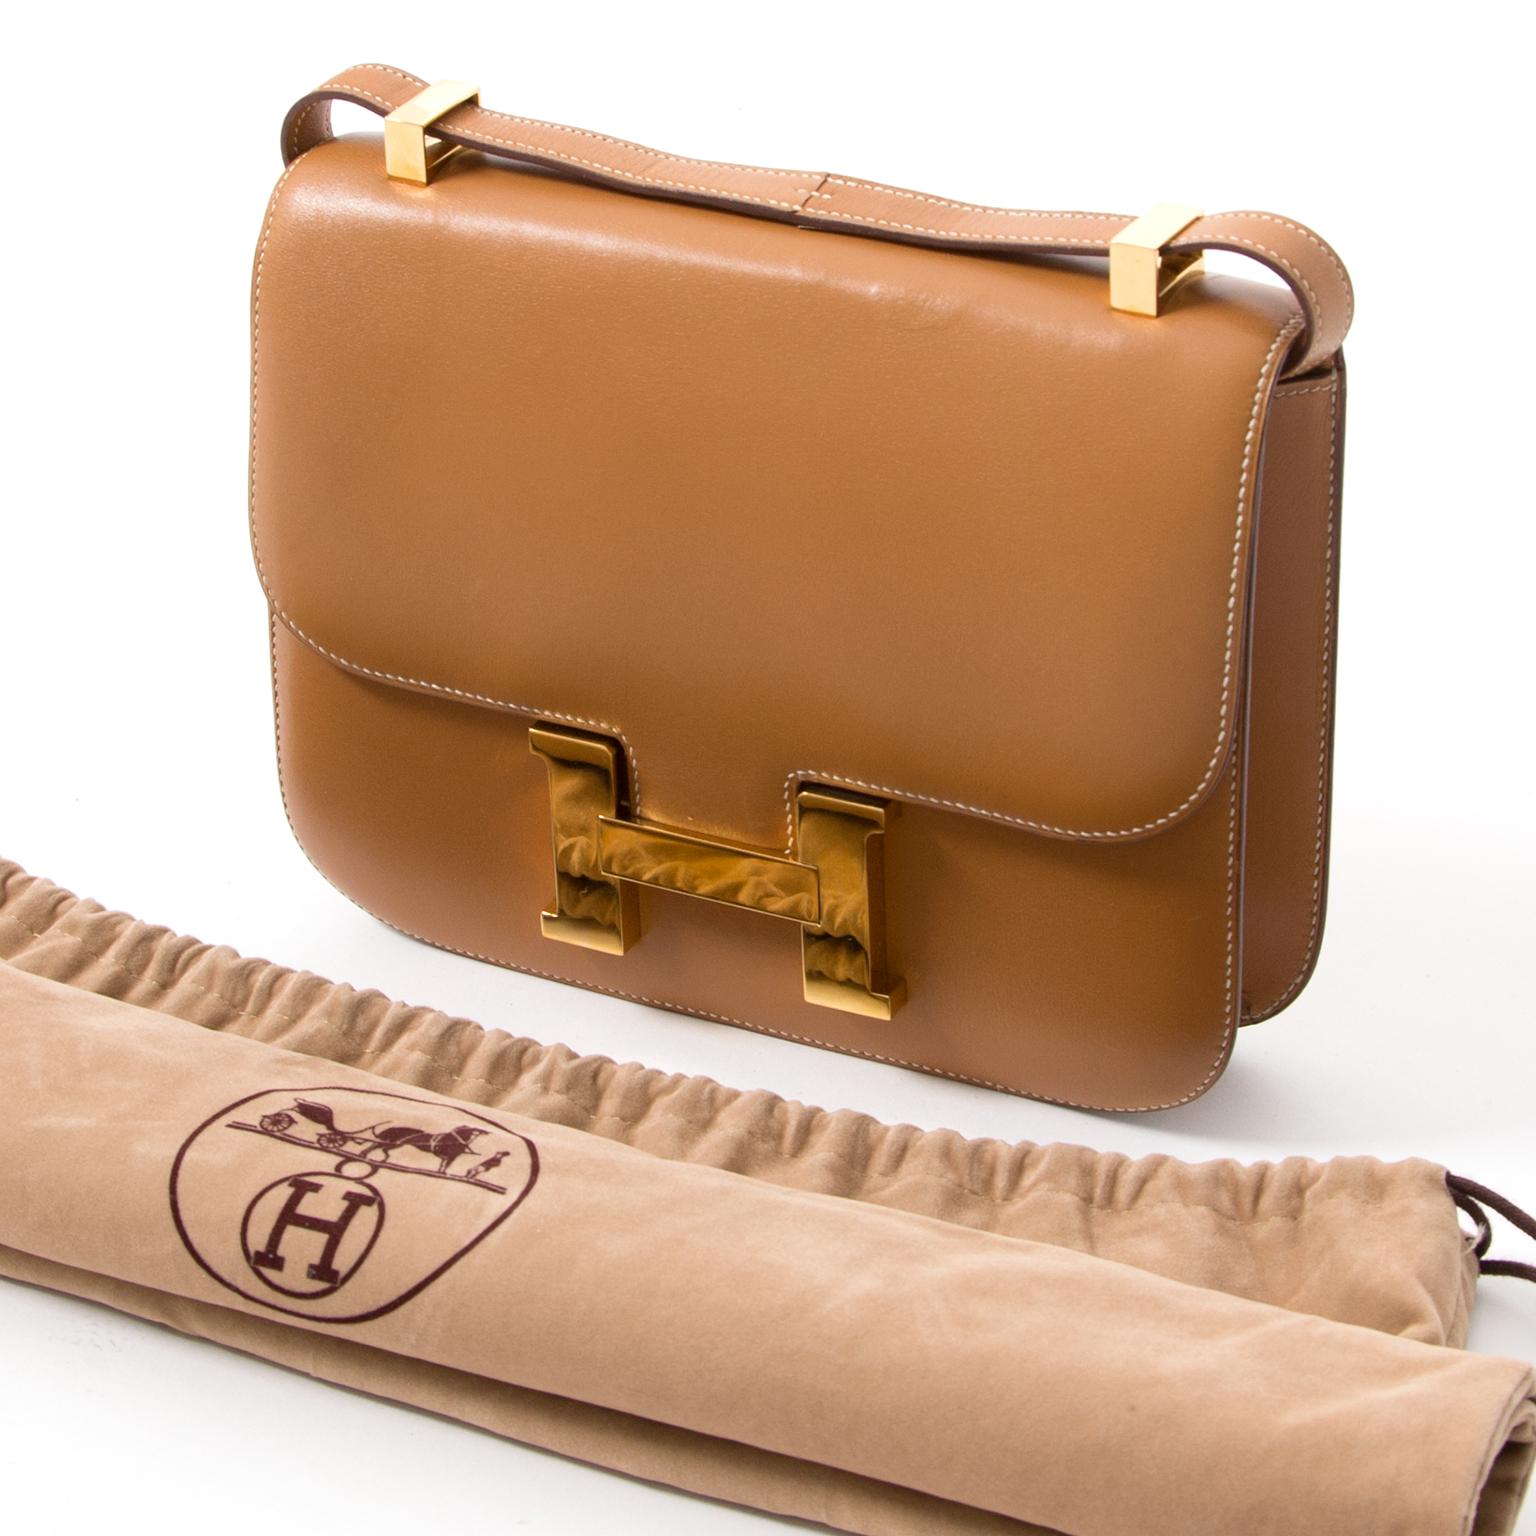 authentic gold Constance Hermes vintage secondhand webshop safe and secure designer shopping Labellov veilig tweedehand luxe merken tassen